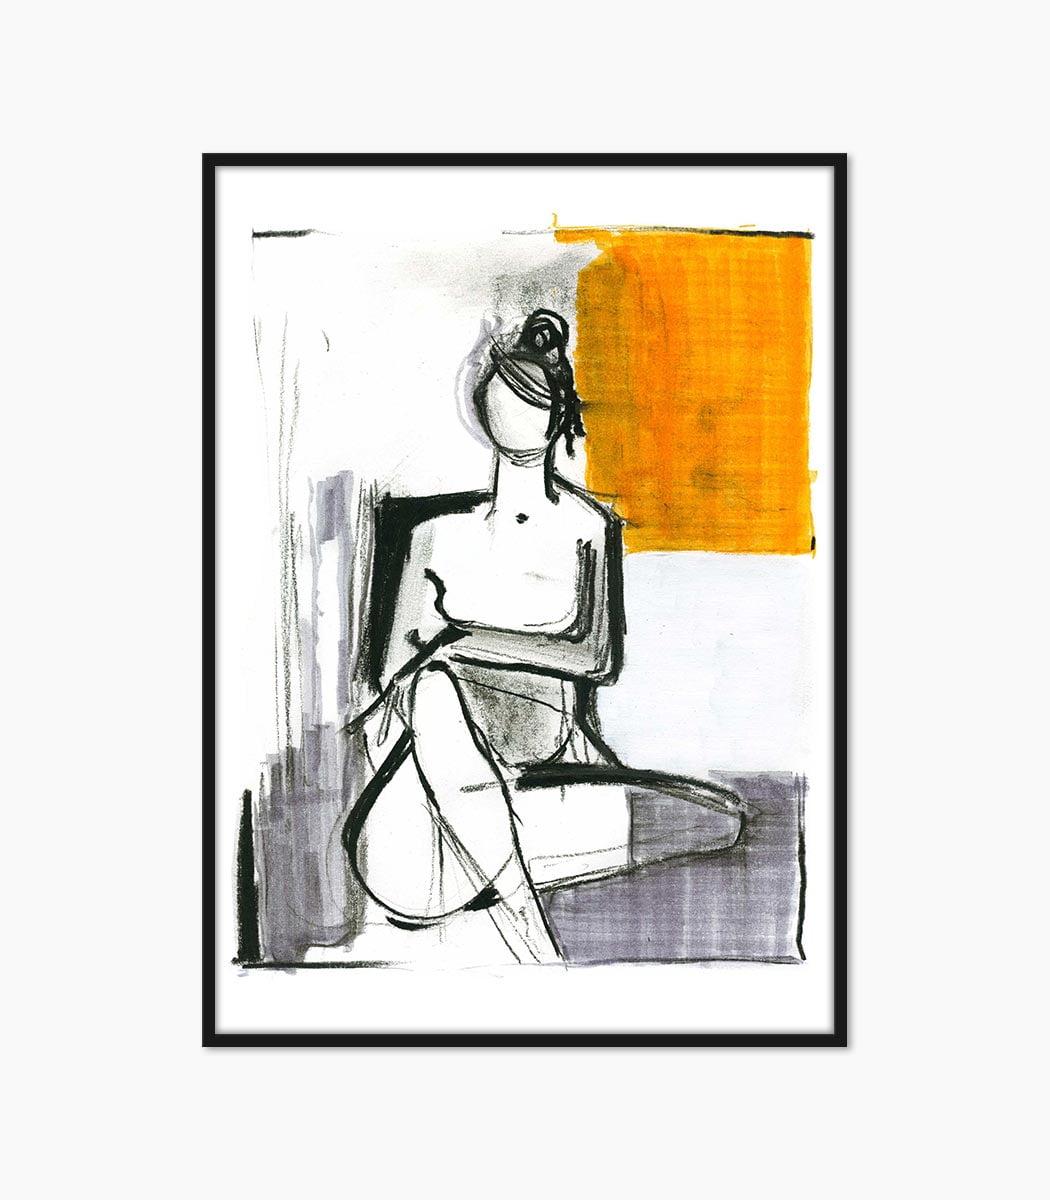 print pictura creata manual si printata la calitate superioara numai pe www.artwall.ro